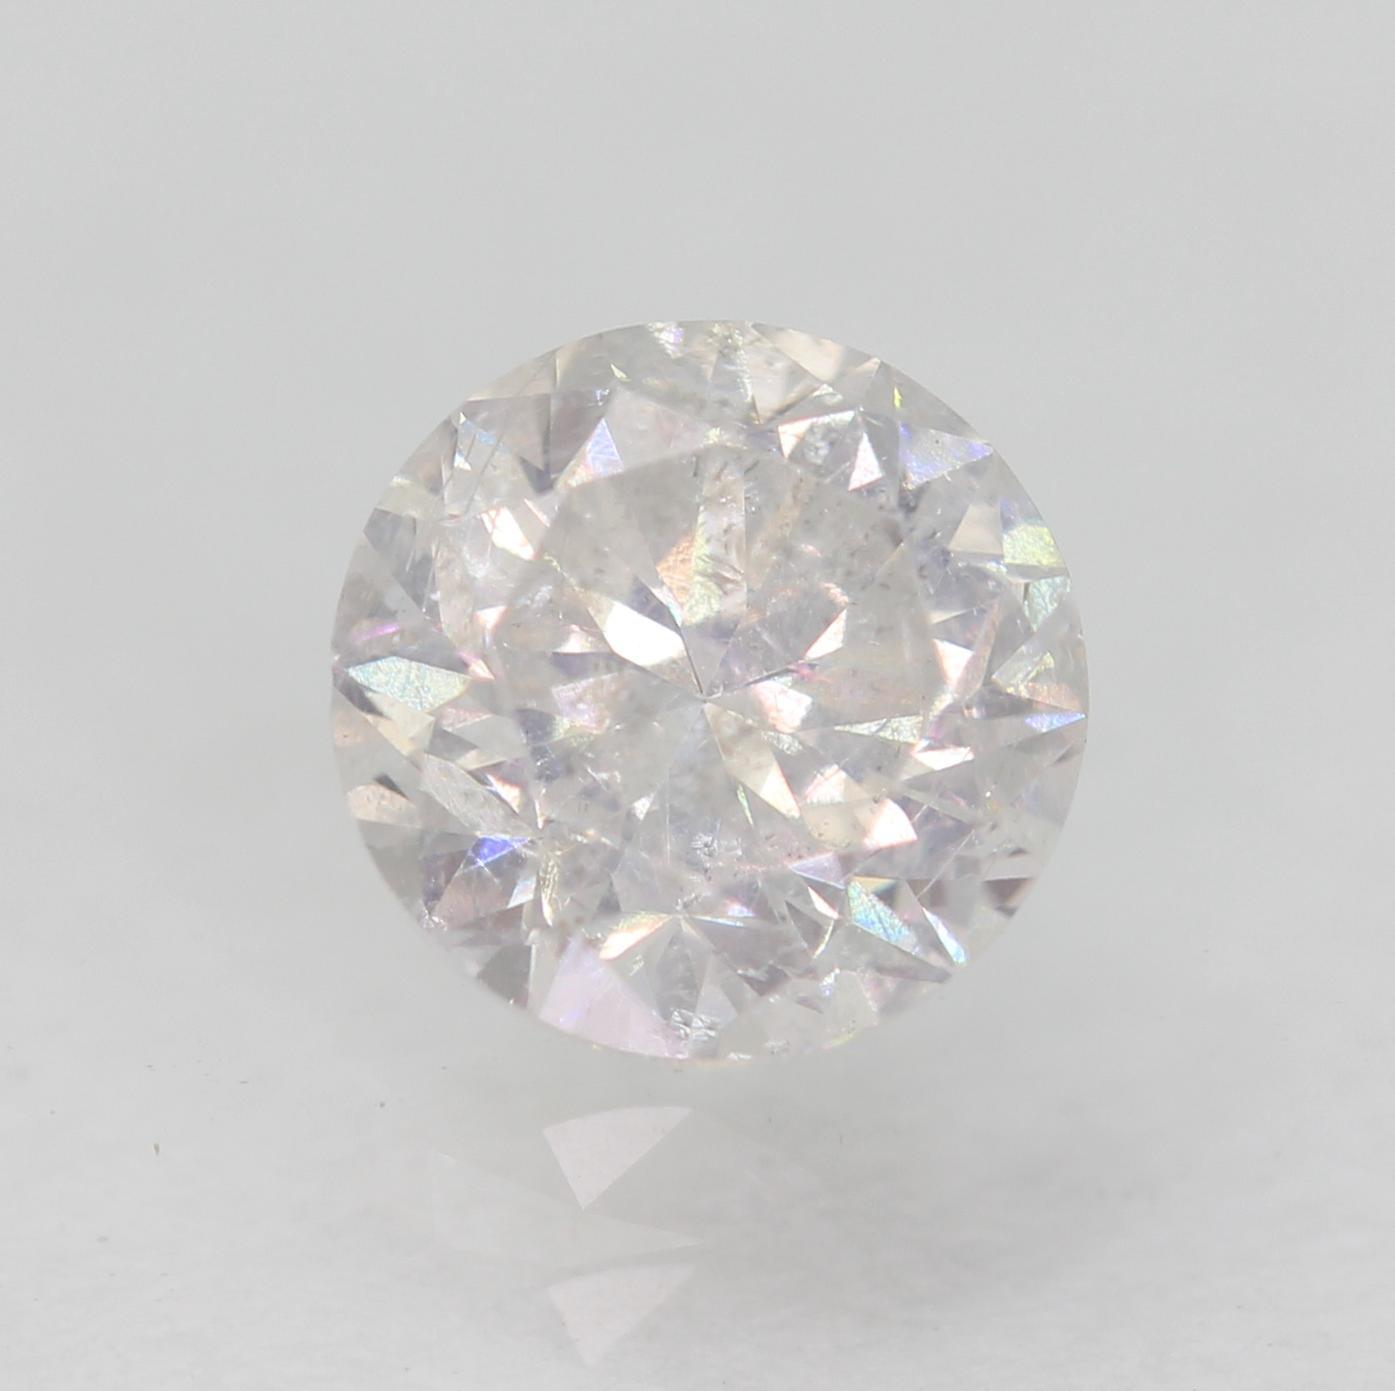 Certified 0.48 Carat D SI2 Round Brilliant Enhanced Natural Diamond 4.85m EX CUT